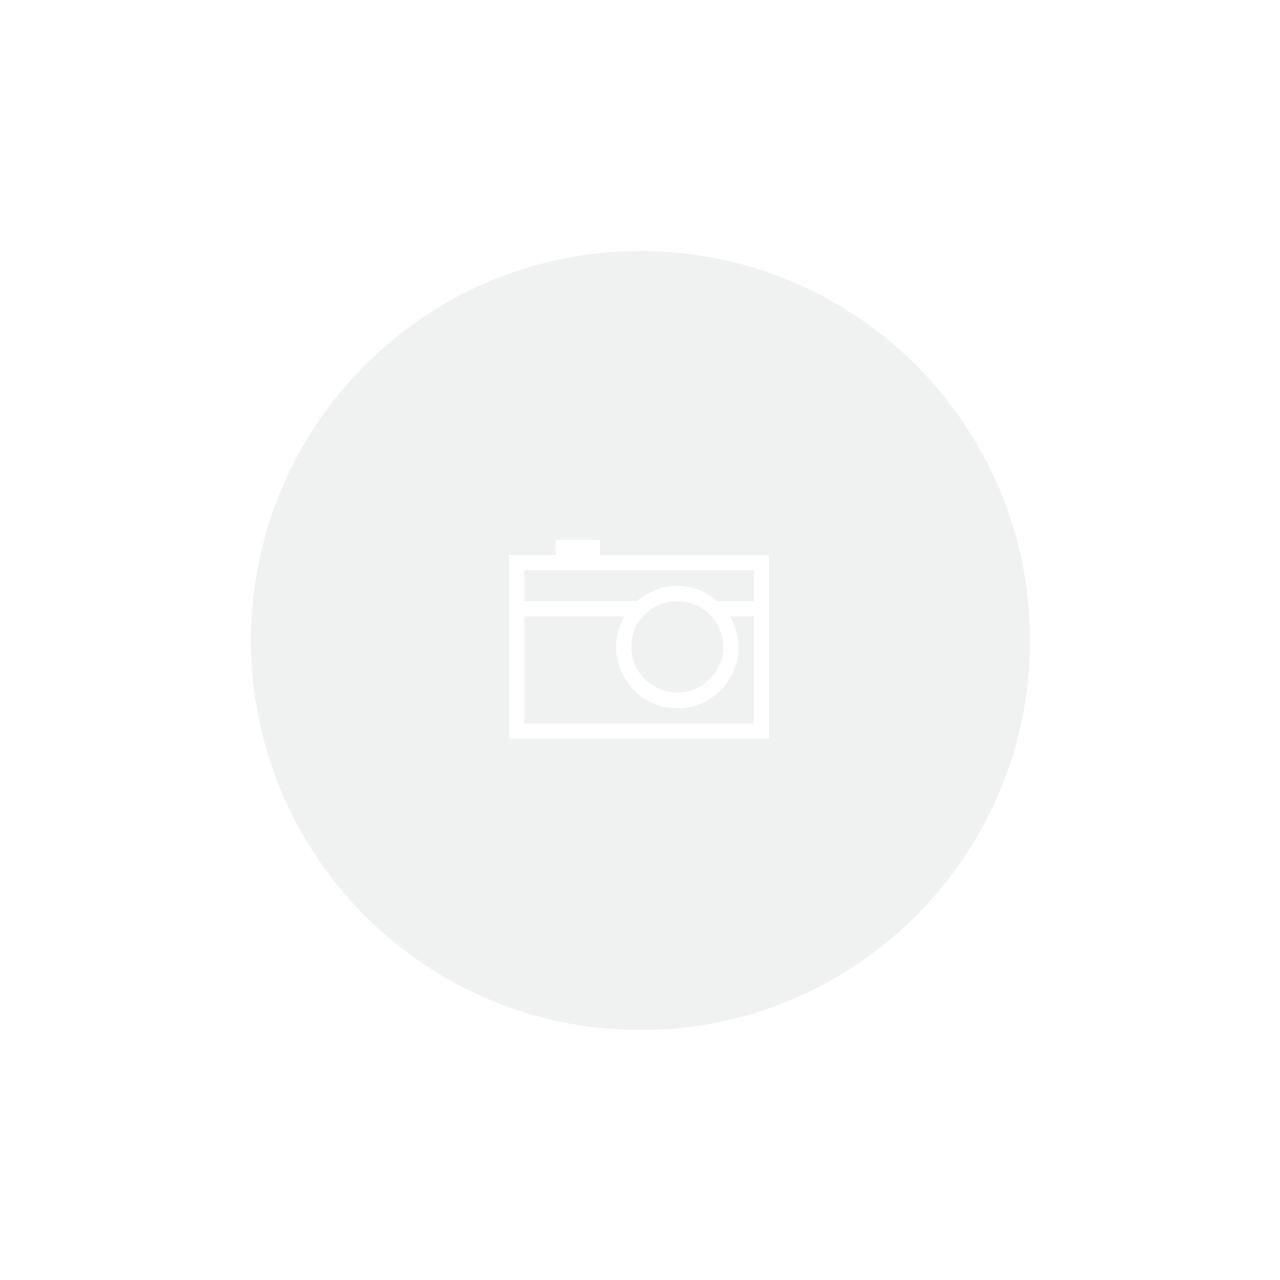 Cupinicida Aerossol 6x300 mL